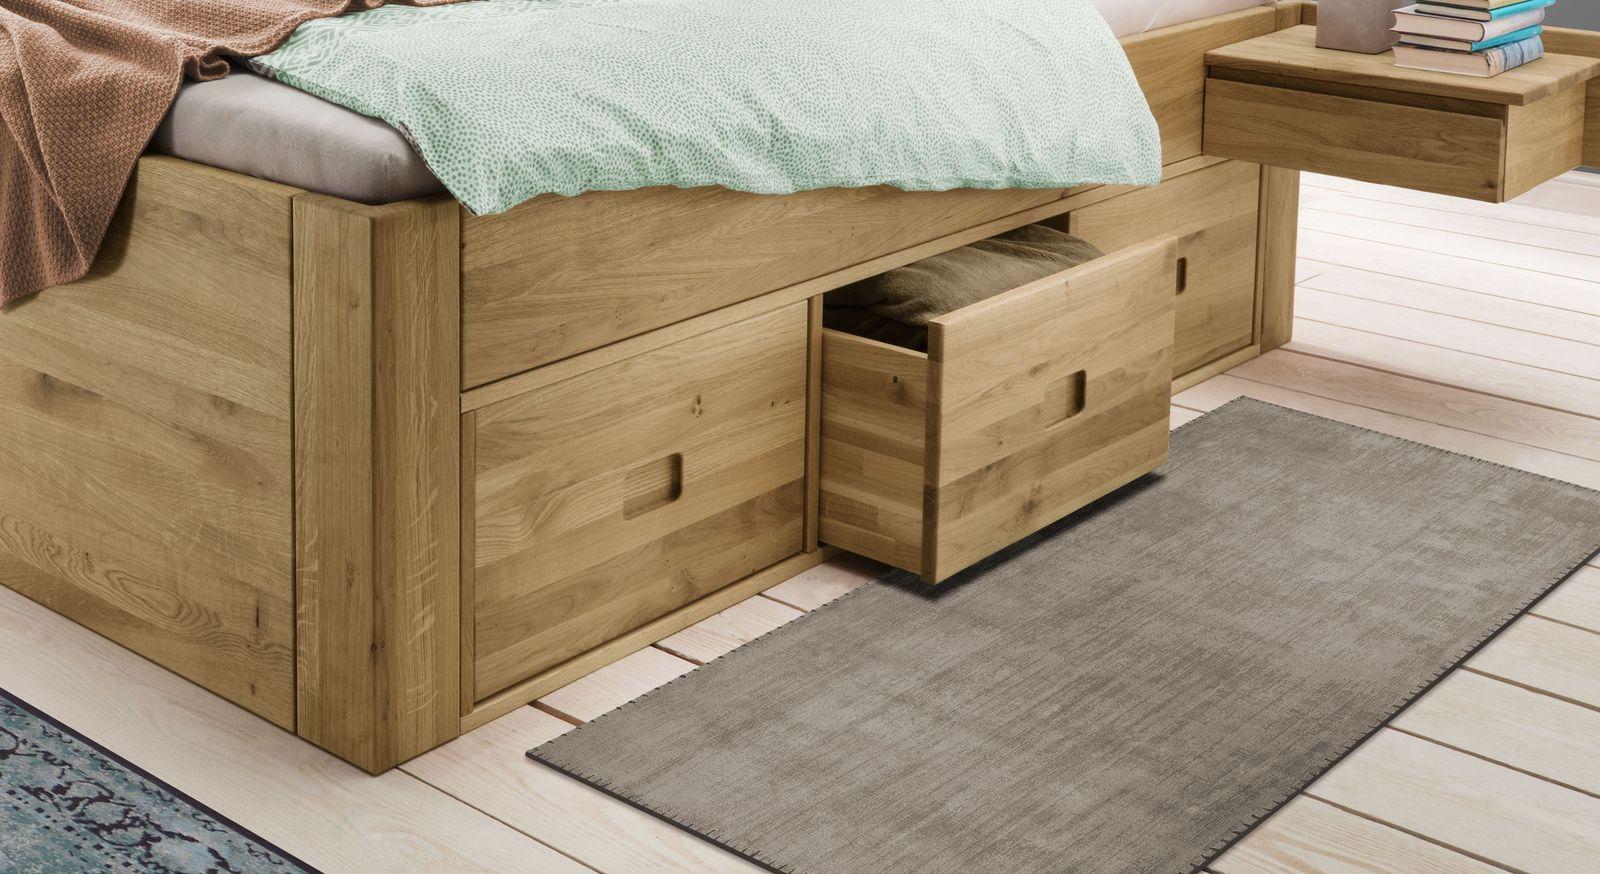 Massivholz-Bett Blumau mit leichtgängigen Schubkästen